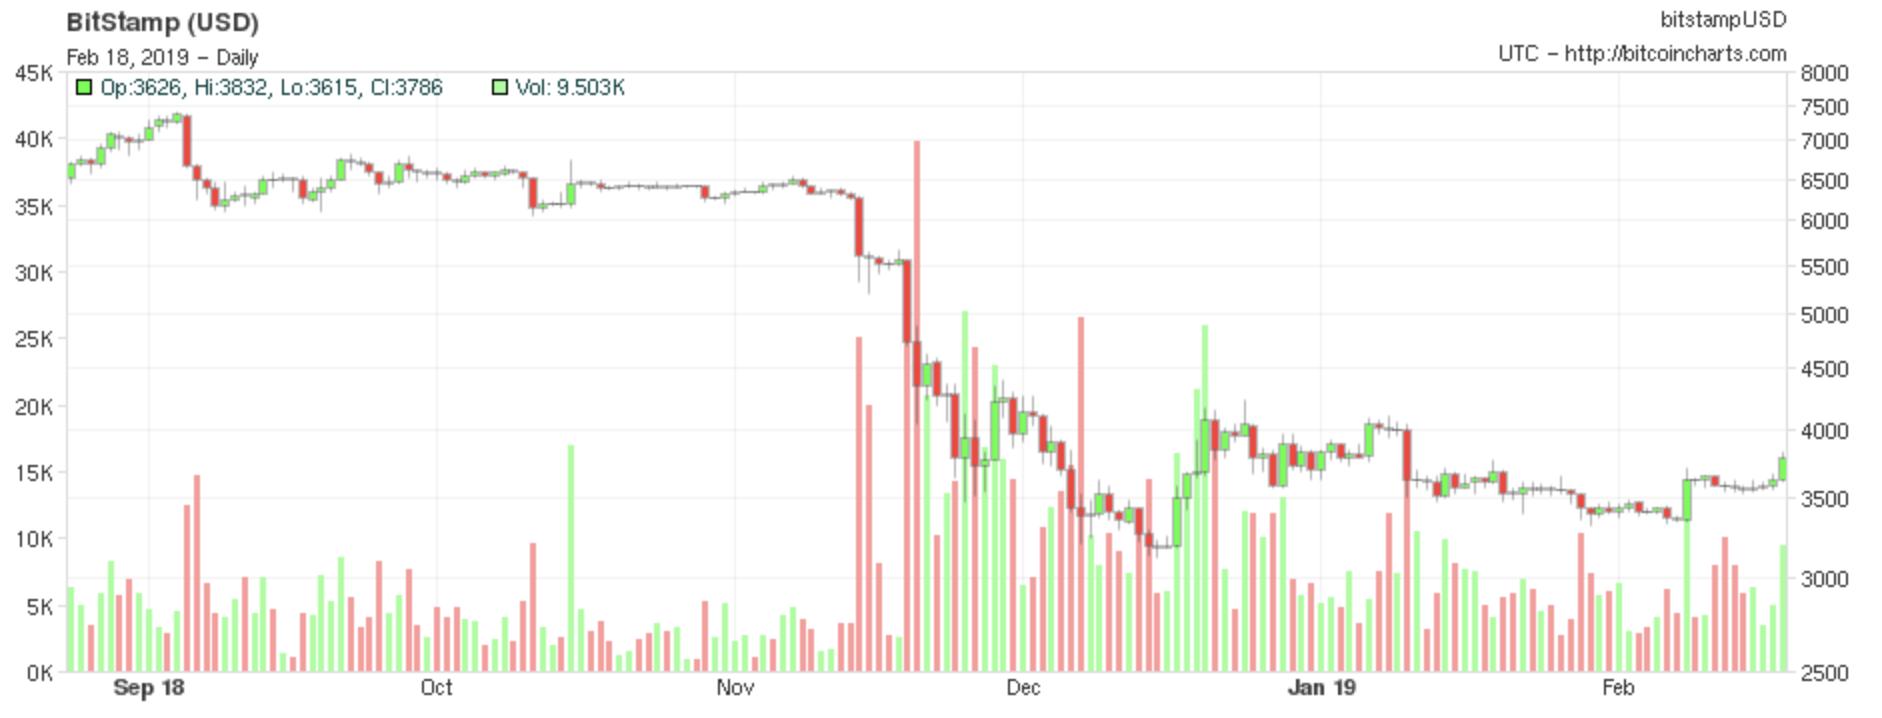 cryptocurrency price floor 6500